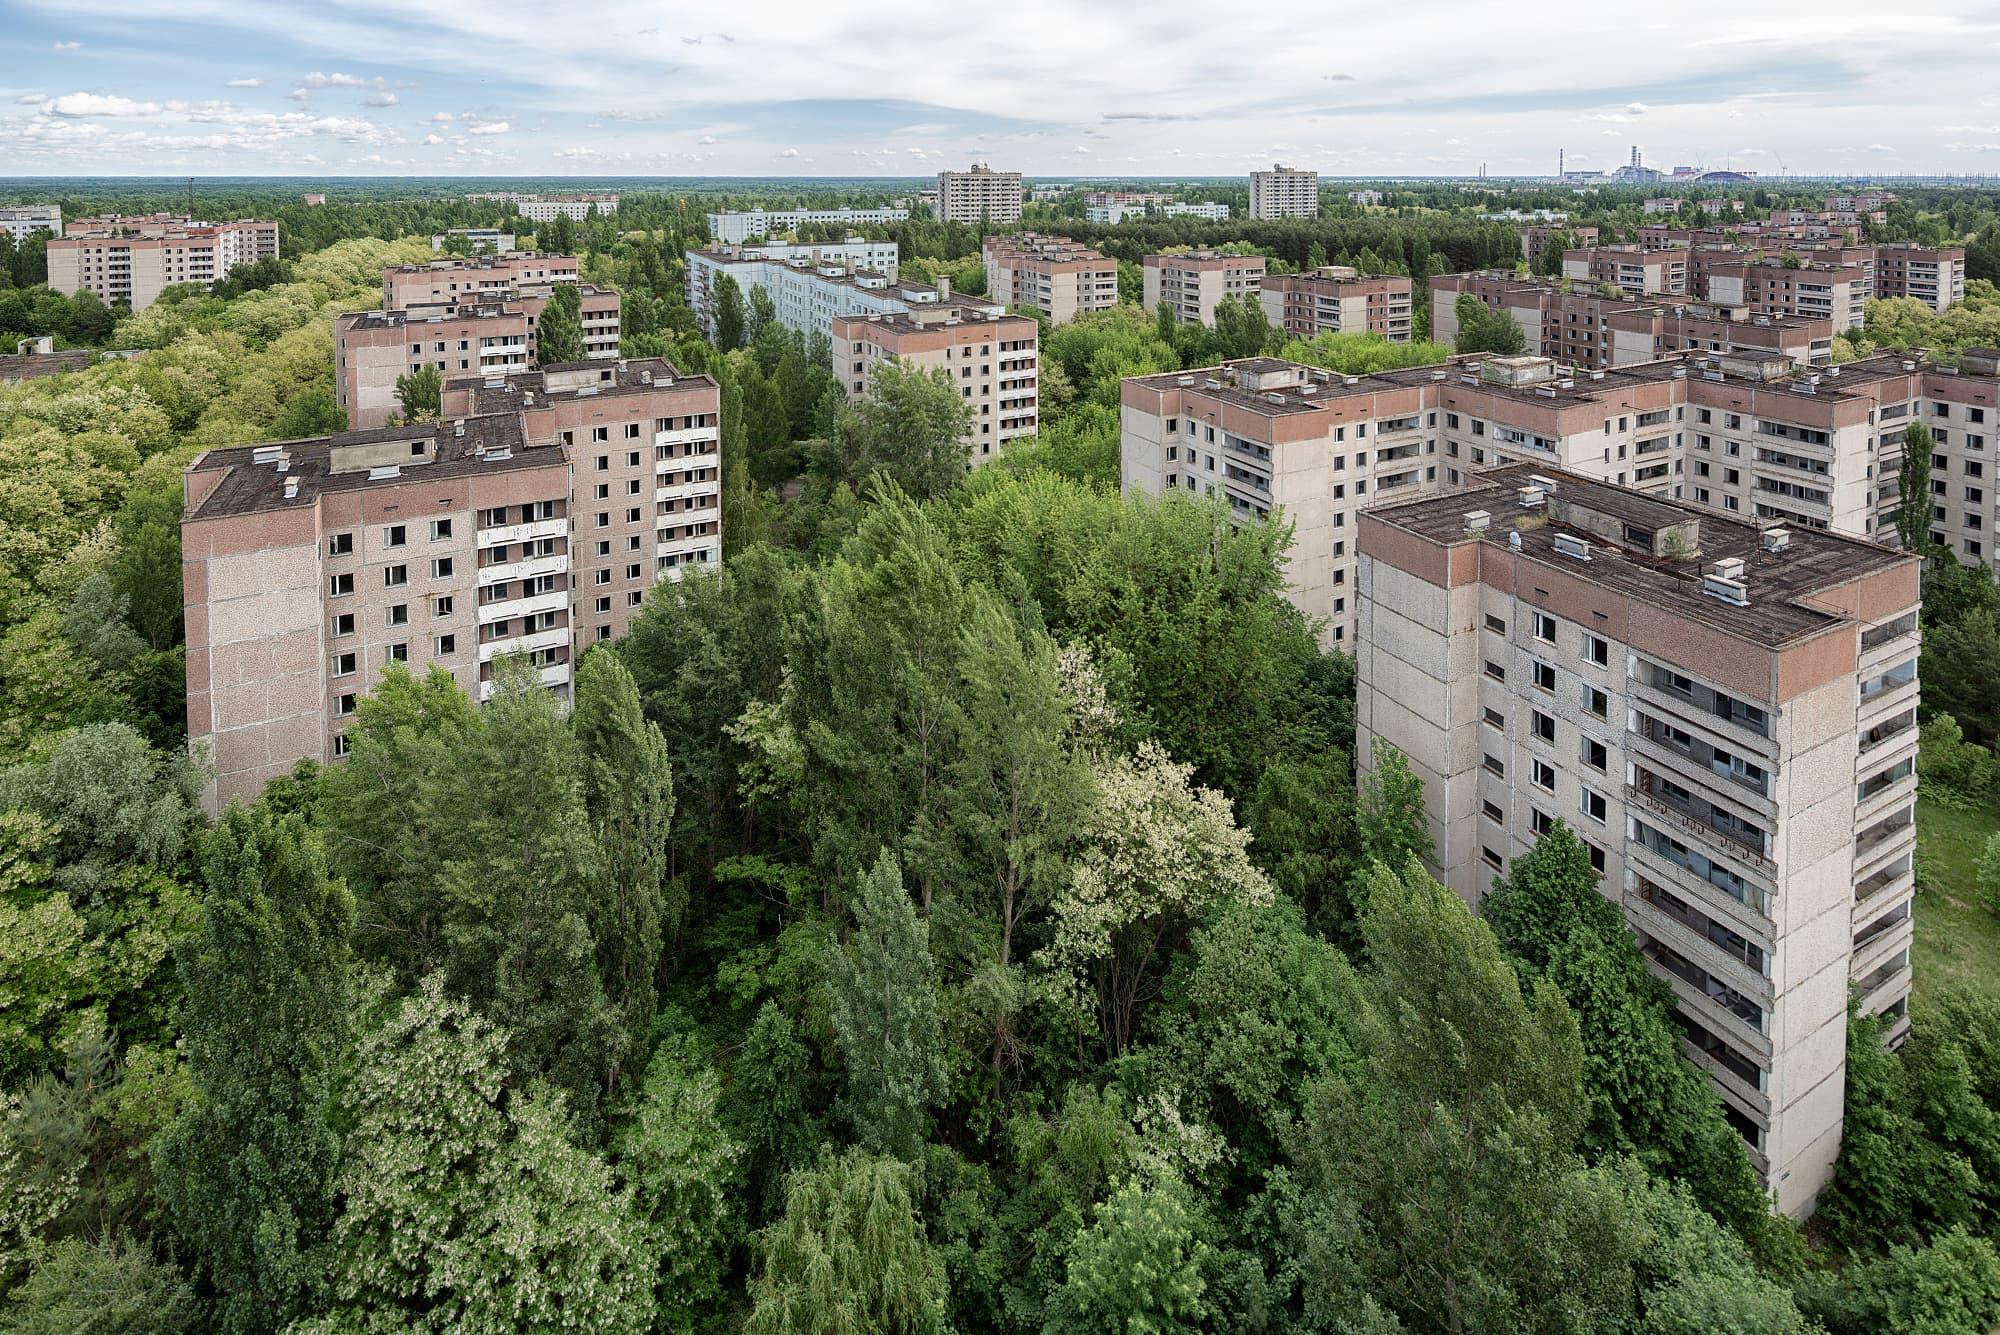 Tschernobyl Natur